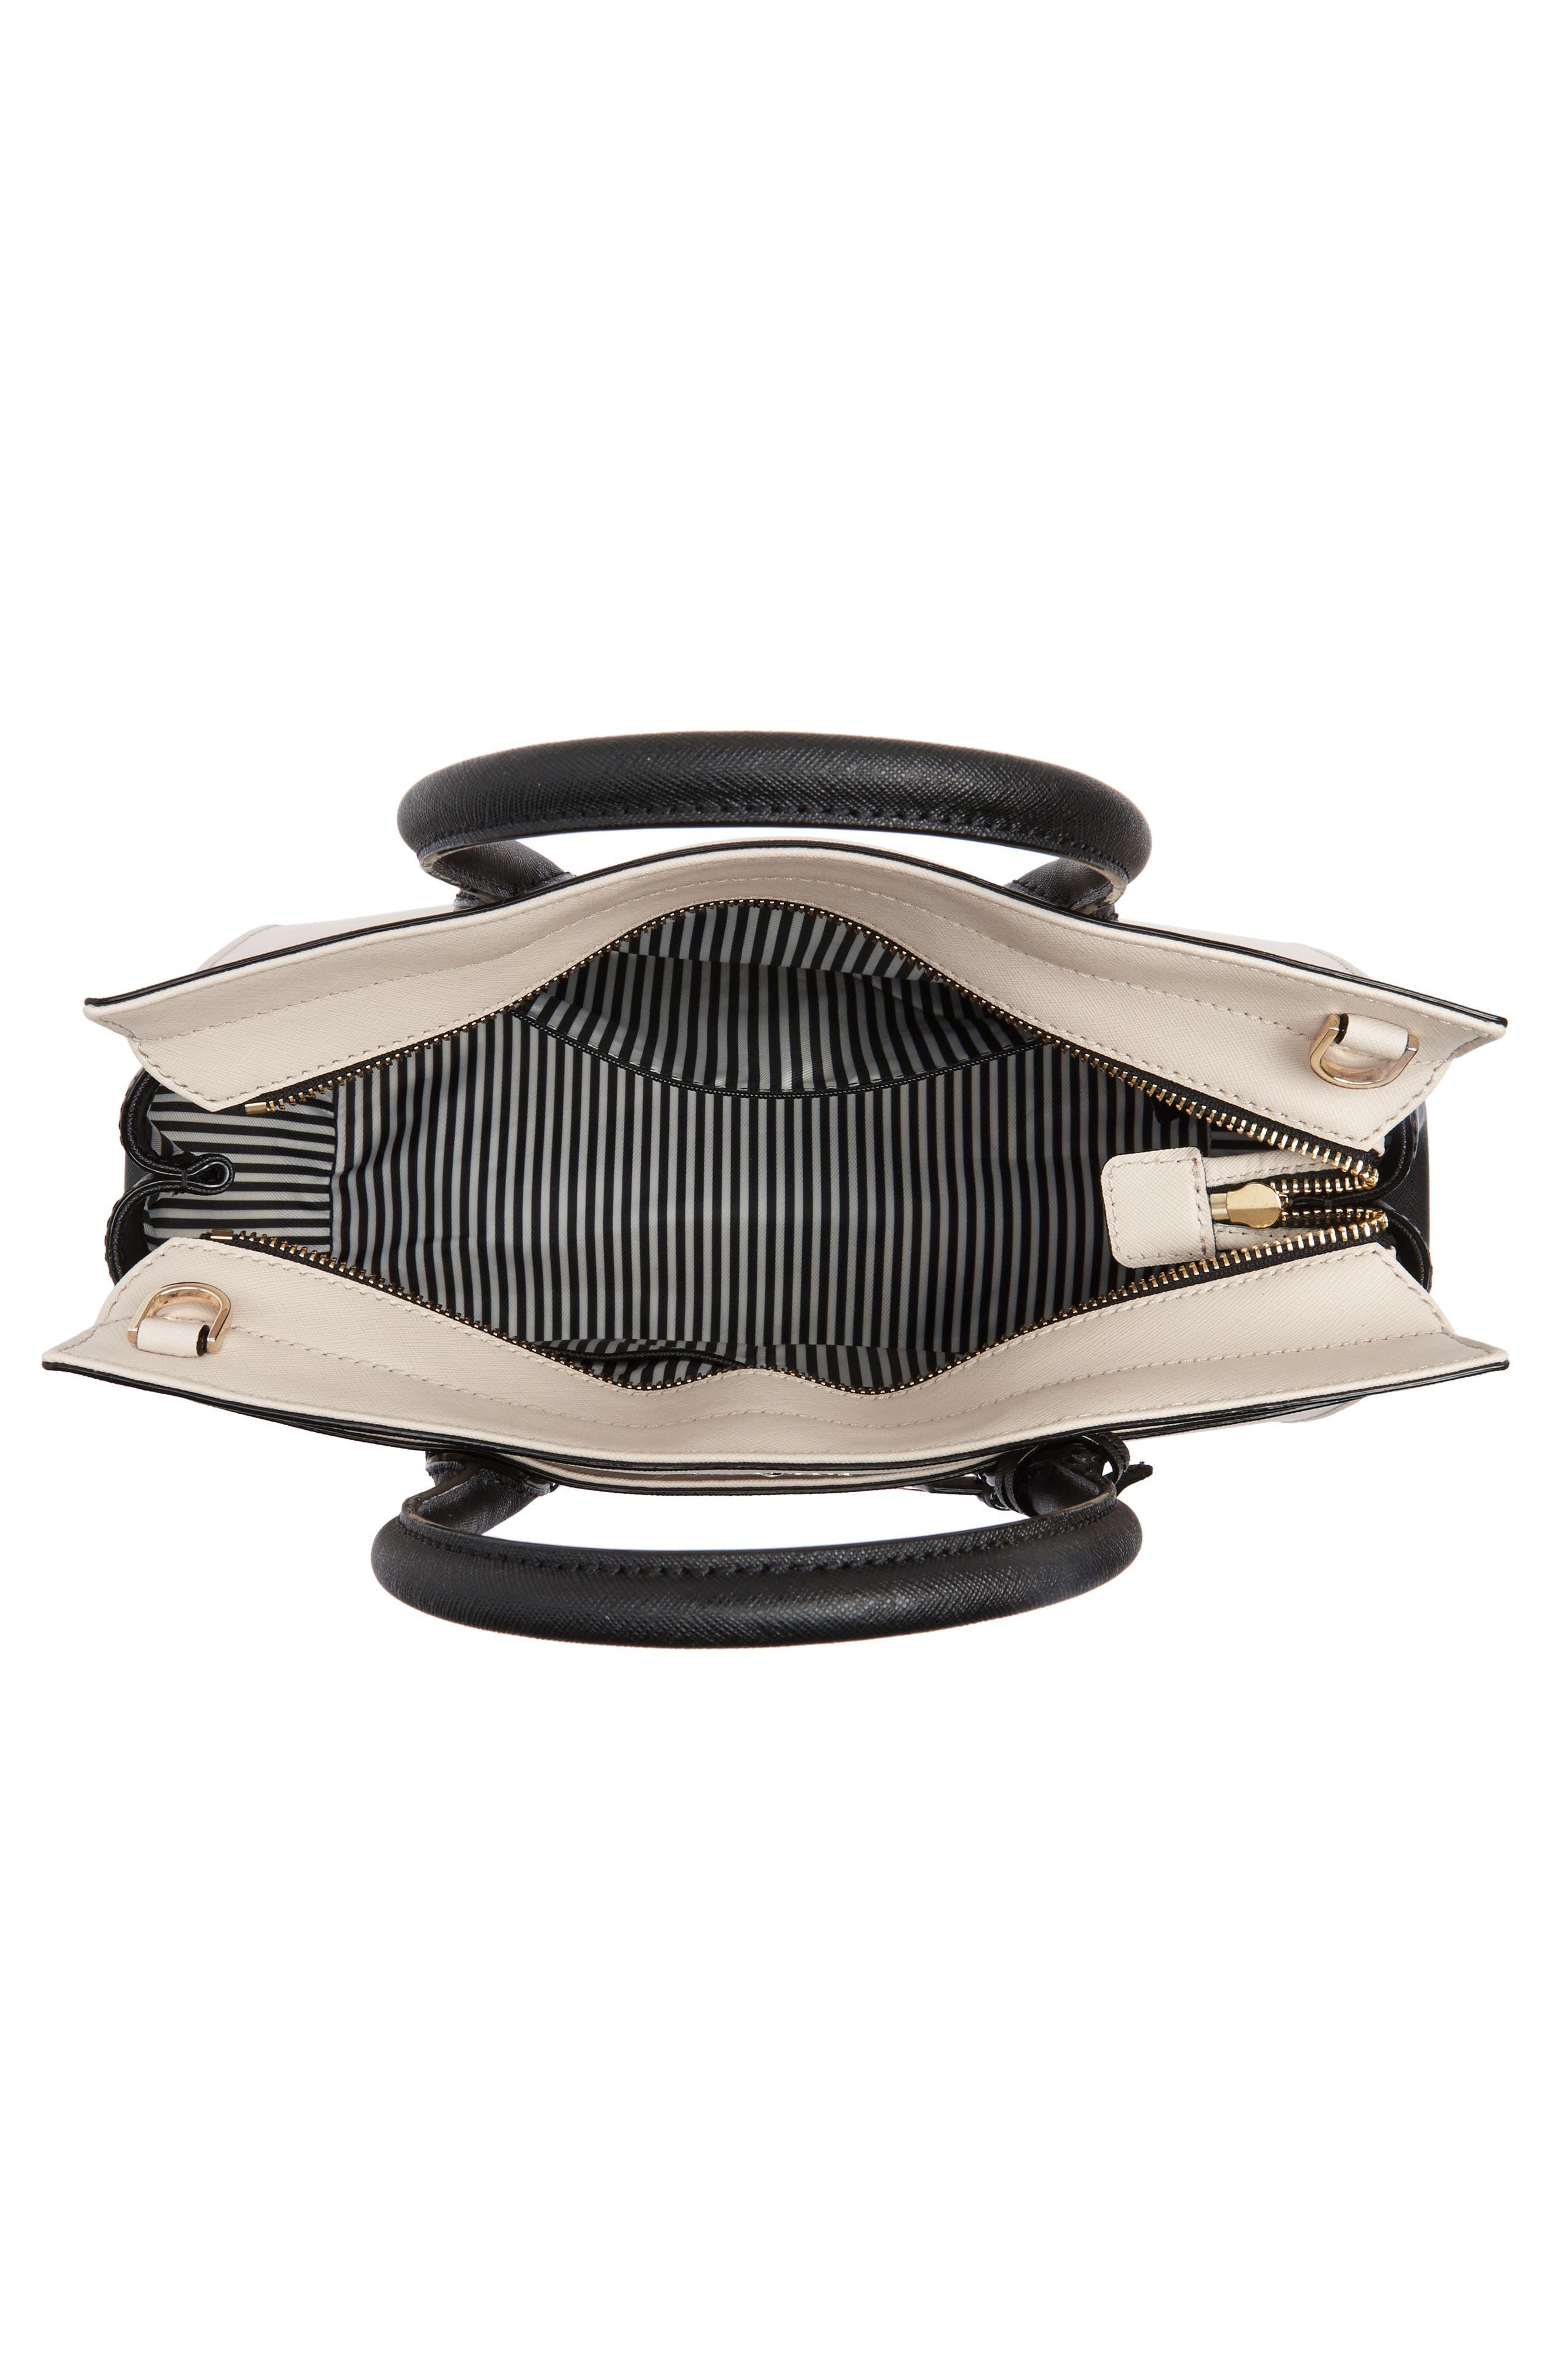 cameron street - candace leather satchel,                             Alternate thumbnail 4, color,                             Tusk/ Black